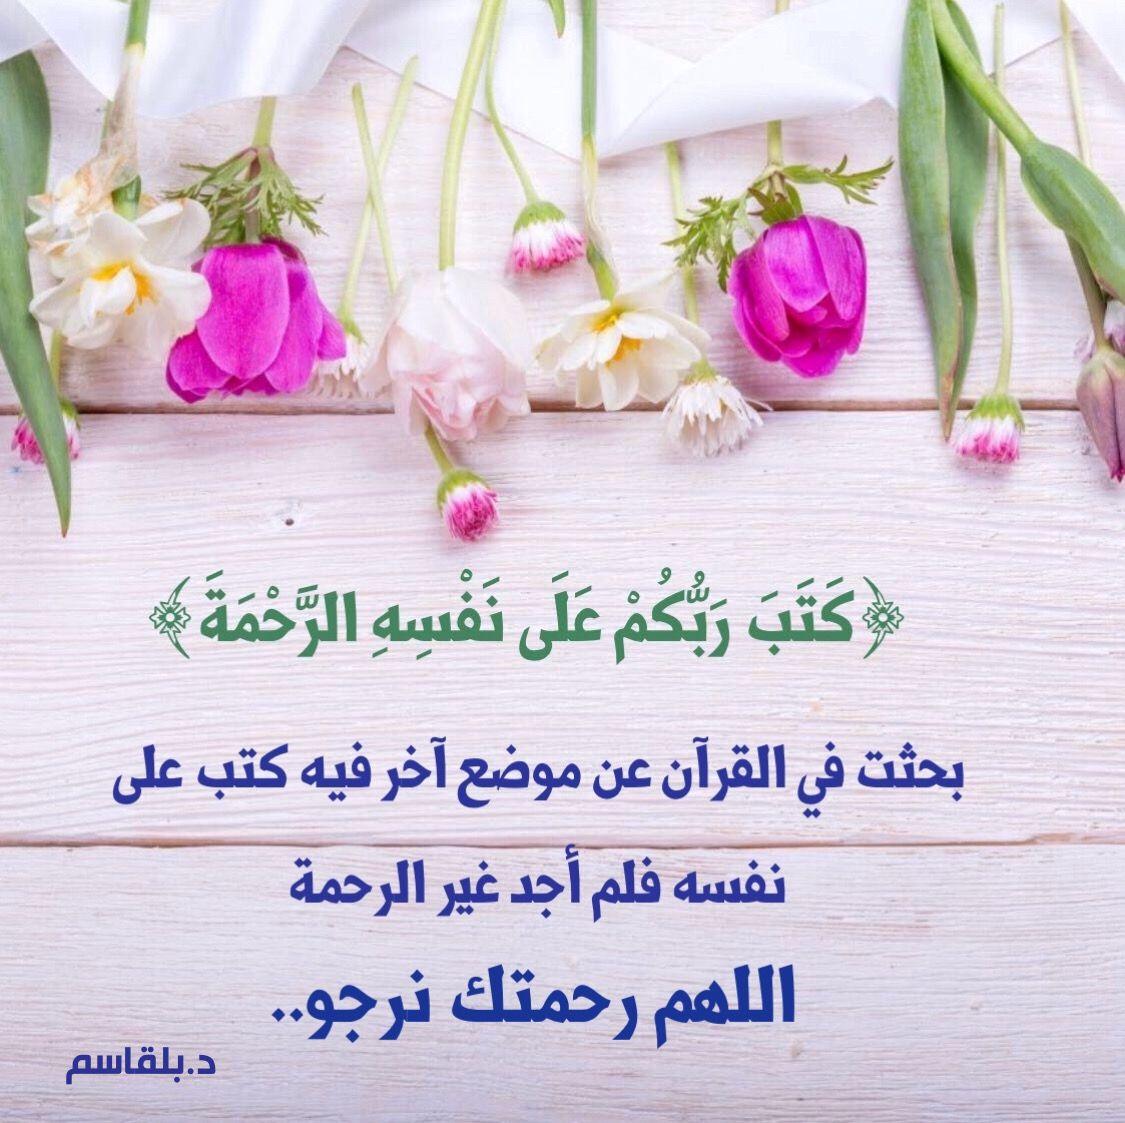 Pin By Najd Alotebi On اقتباسات ٣ Quran Quotes Love Quran Quotes Love Quotes